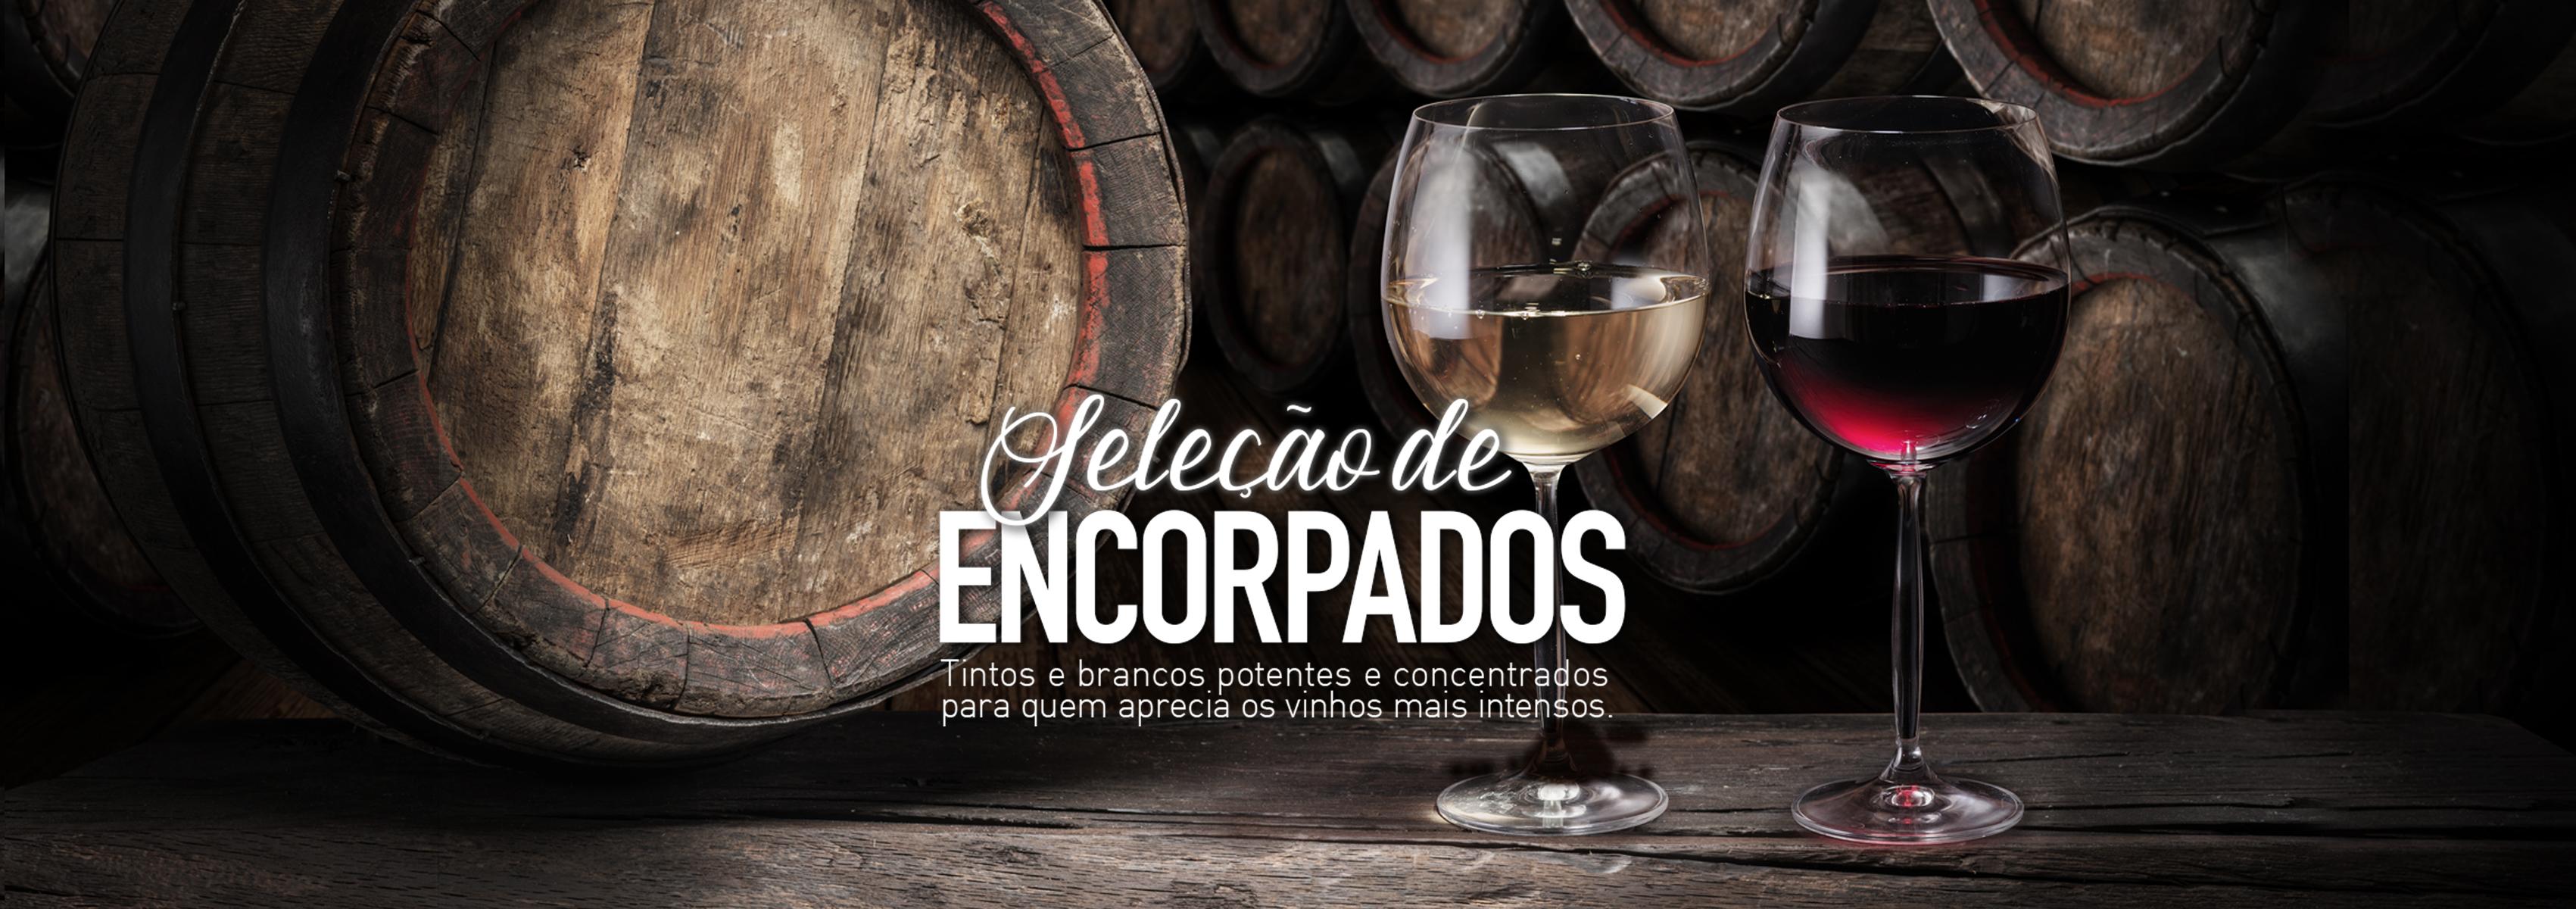 Vinhos Encorpados